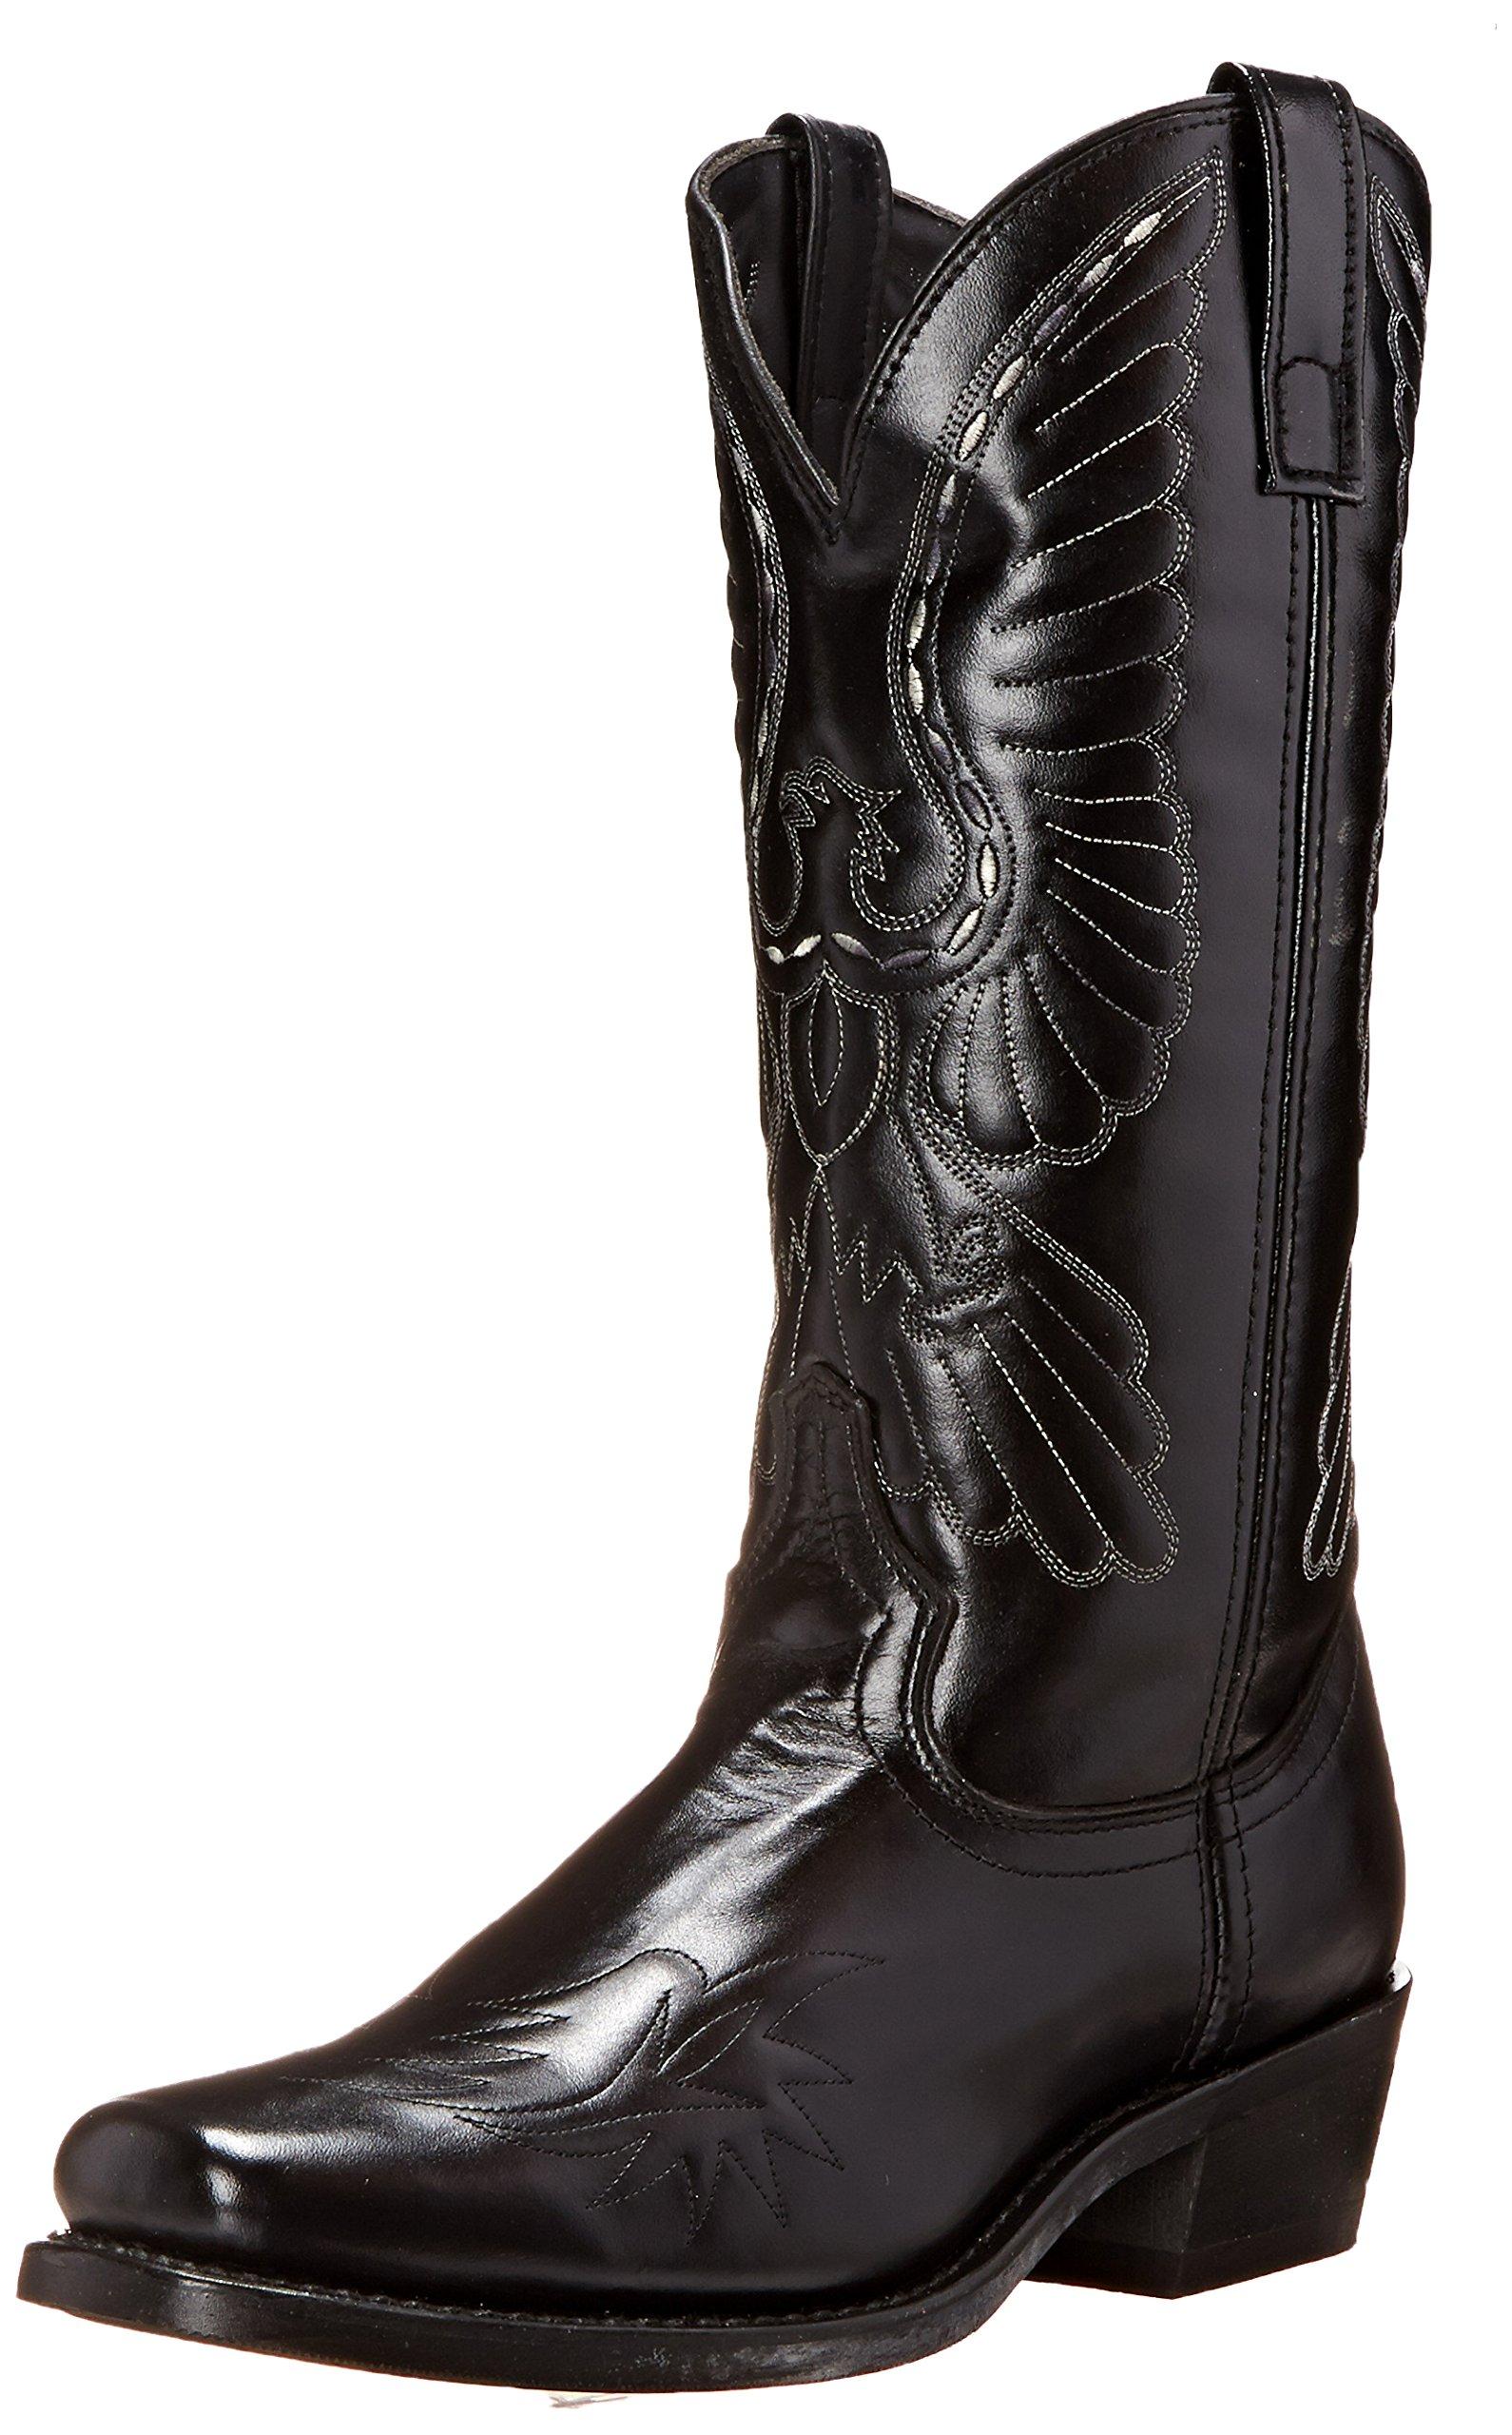 Laredo Men's Gainesville Western Boot, Black, 8 D US